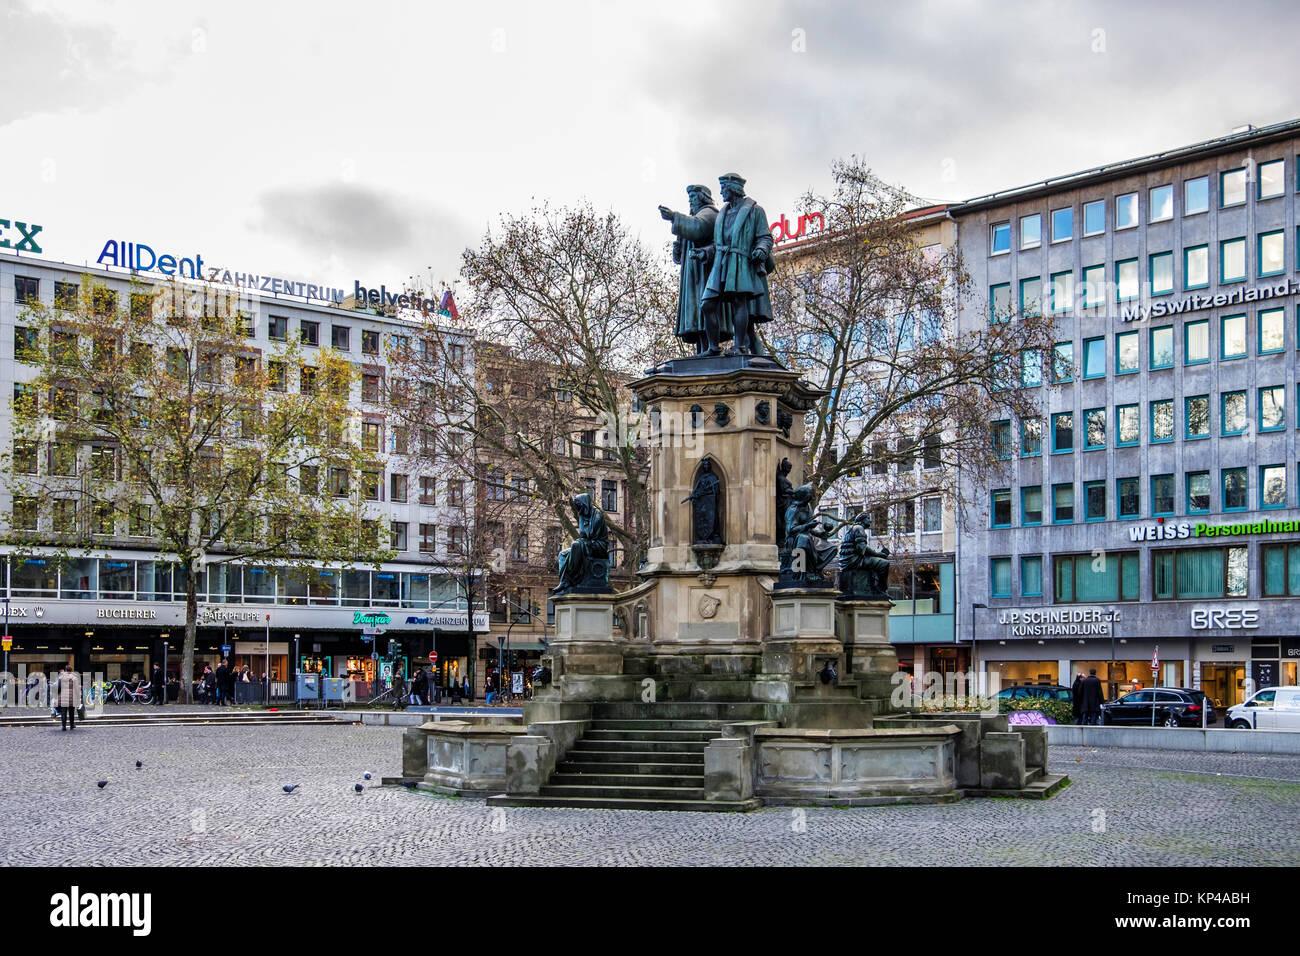 Frankfurt,Rossmarkt square. Johannes Gutenberg memorial statue honours the inventor of the printing press. Bronze - Stock Image